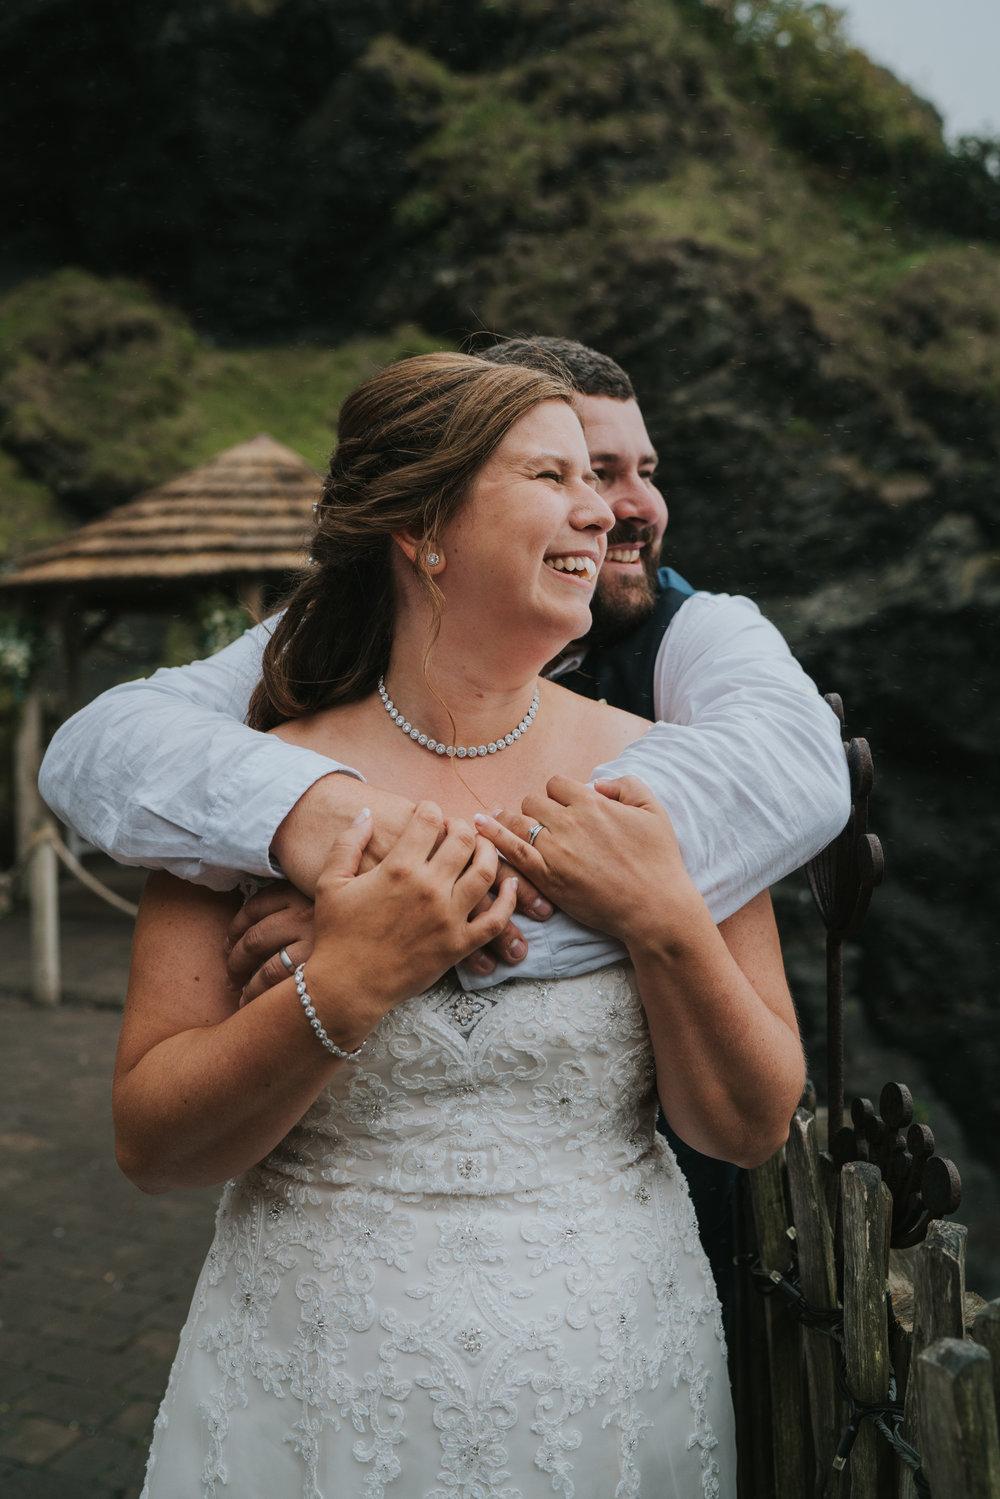 john-amy-relaxed-beach-wedding-tunnels-beaches-ilfracombe-north-devon-grace-elizabeth-colchester-essex-alternative-relaxed-wedding-photography-devon-suffolk-norfolk-essex (134 of 159).jpg